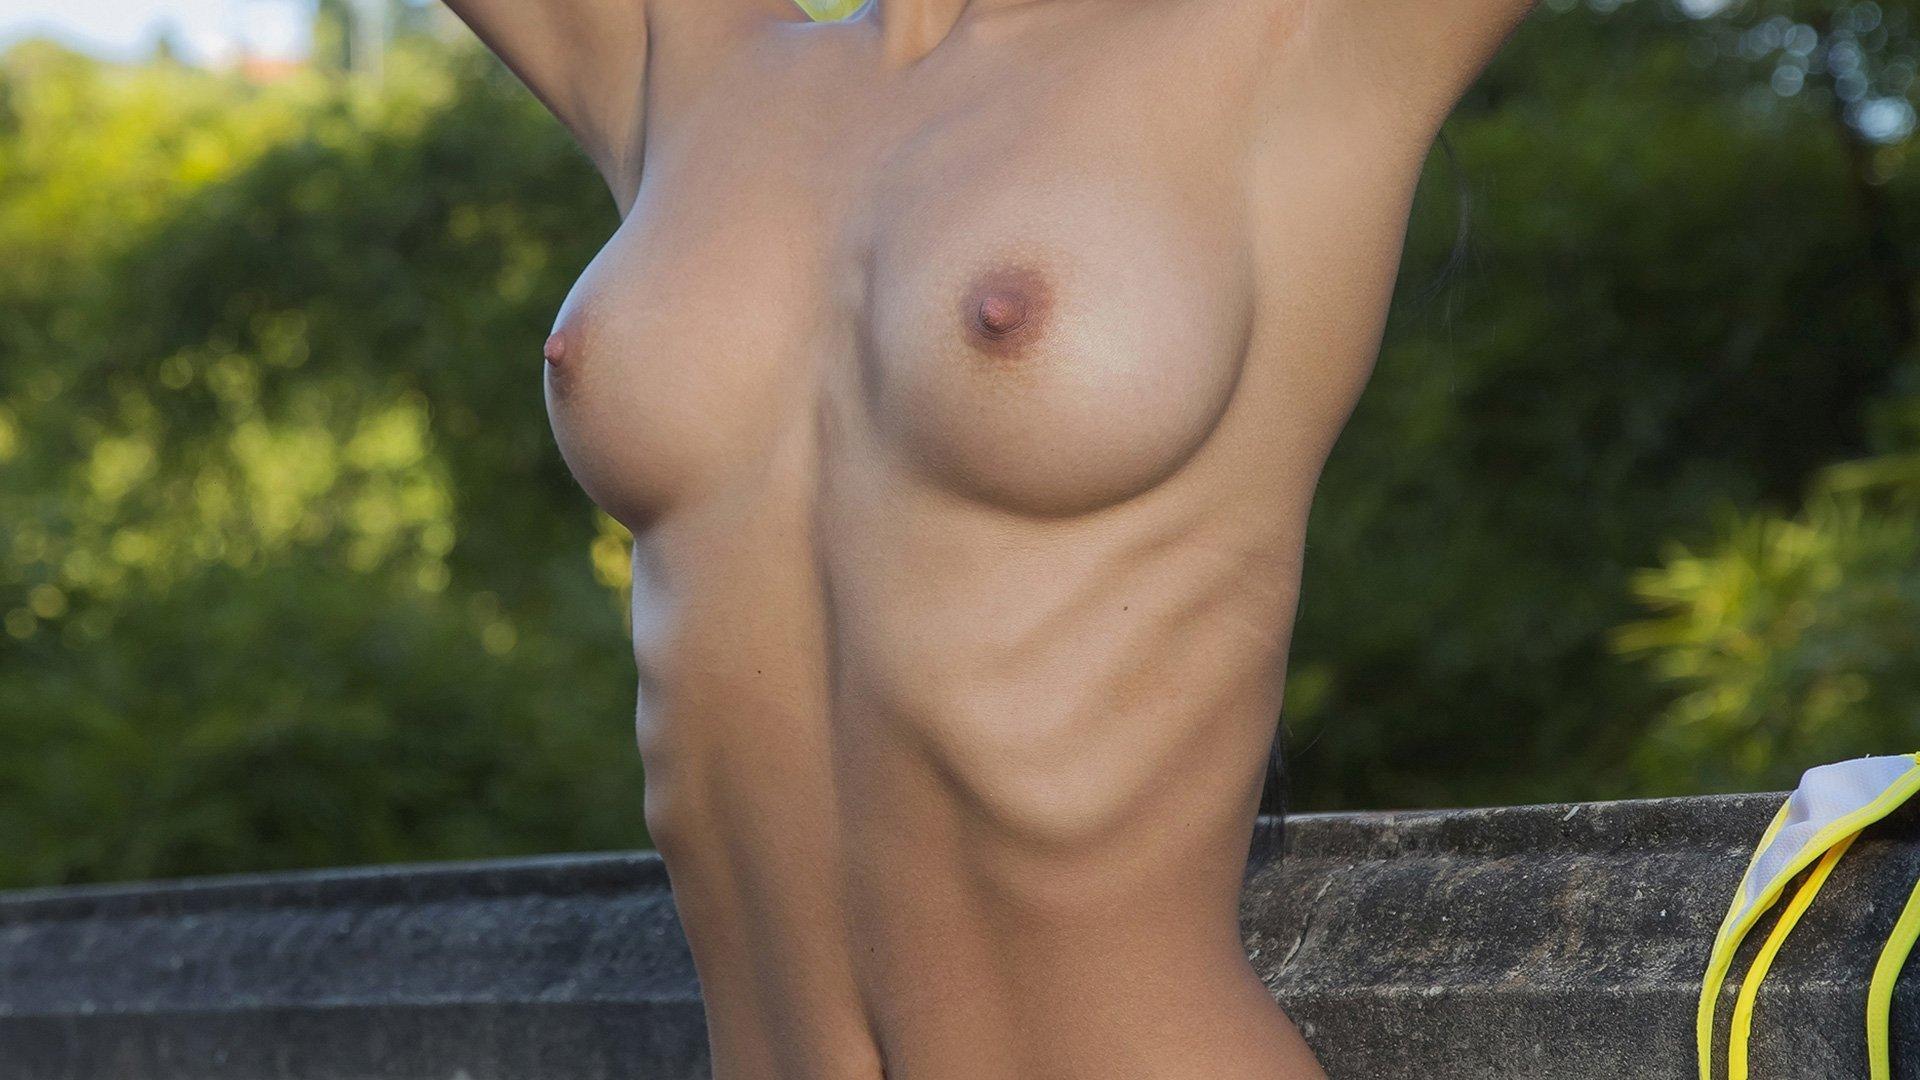 Small boobs, big dreams art print by alexvoss